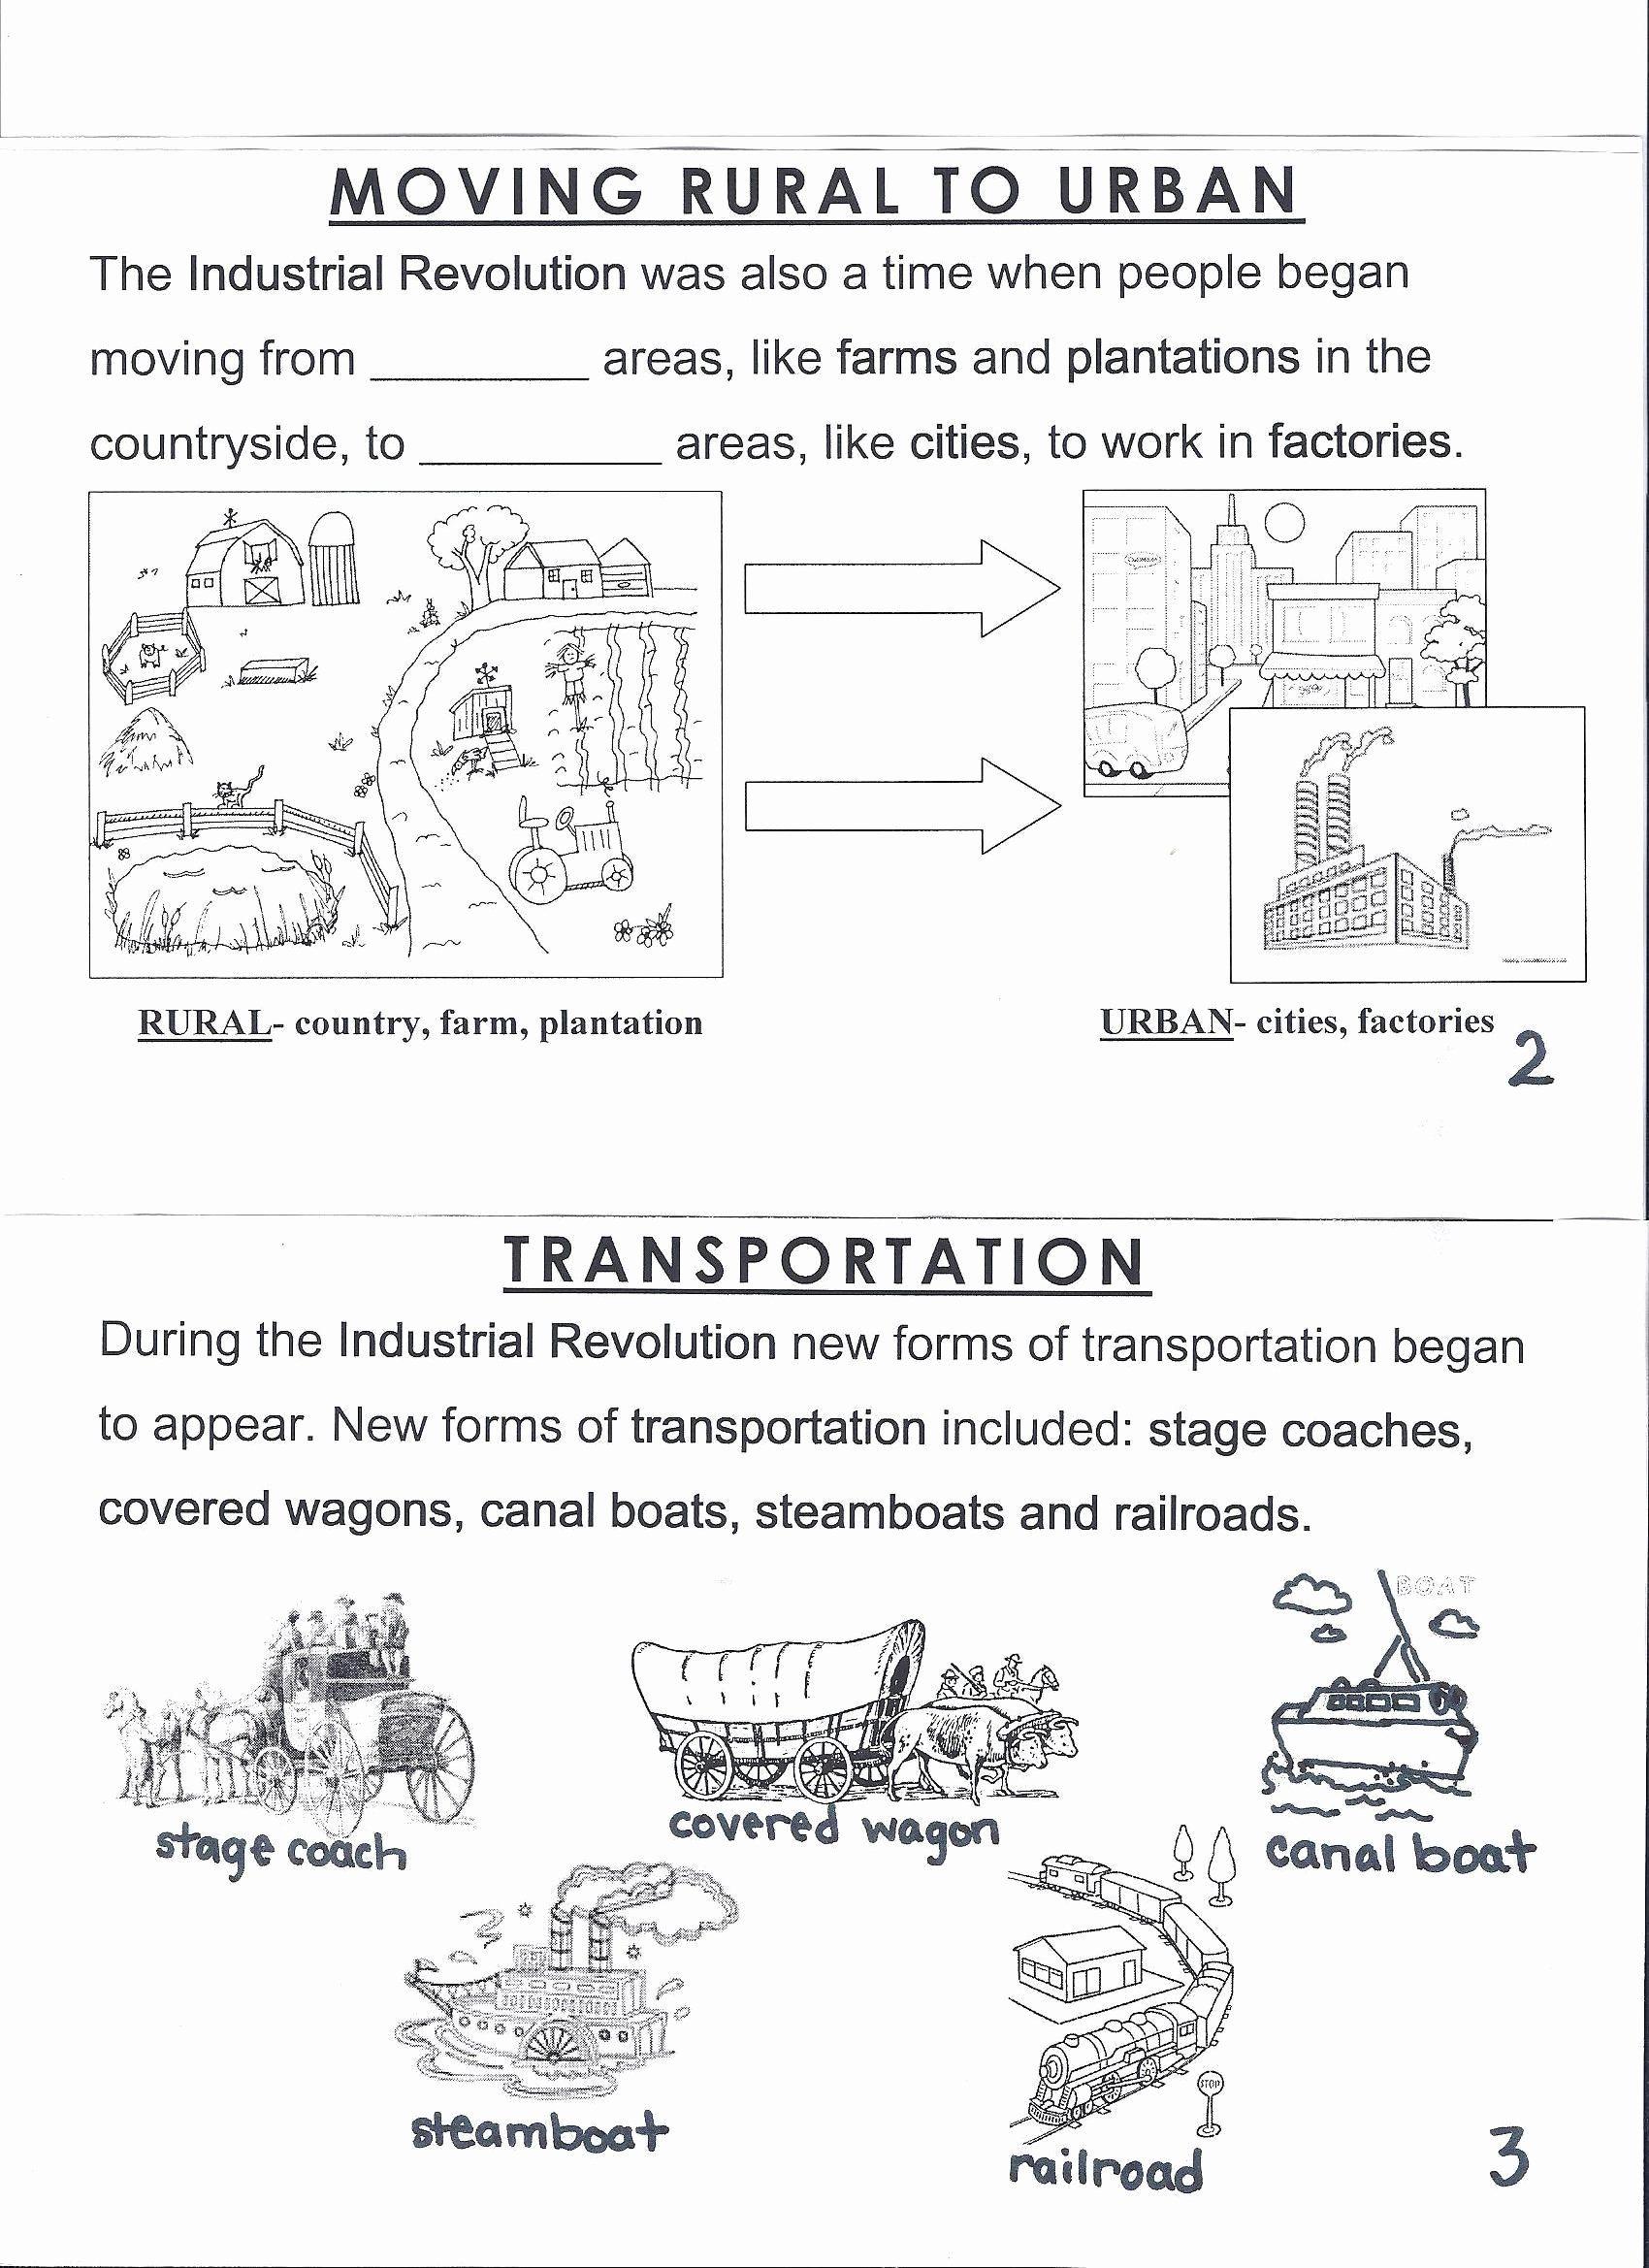 American Industrial Revolution Worksheet Lovely Industrial Revolution 2 1 Industrial Revolution Activities Industrial Revolution Lessons Industrial Revolution [ 2338 x 1700 Pixel ]